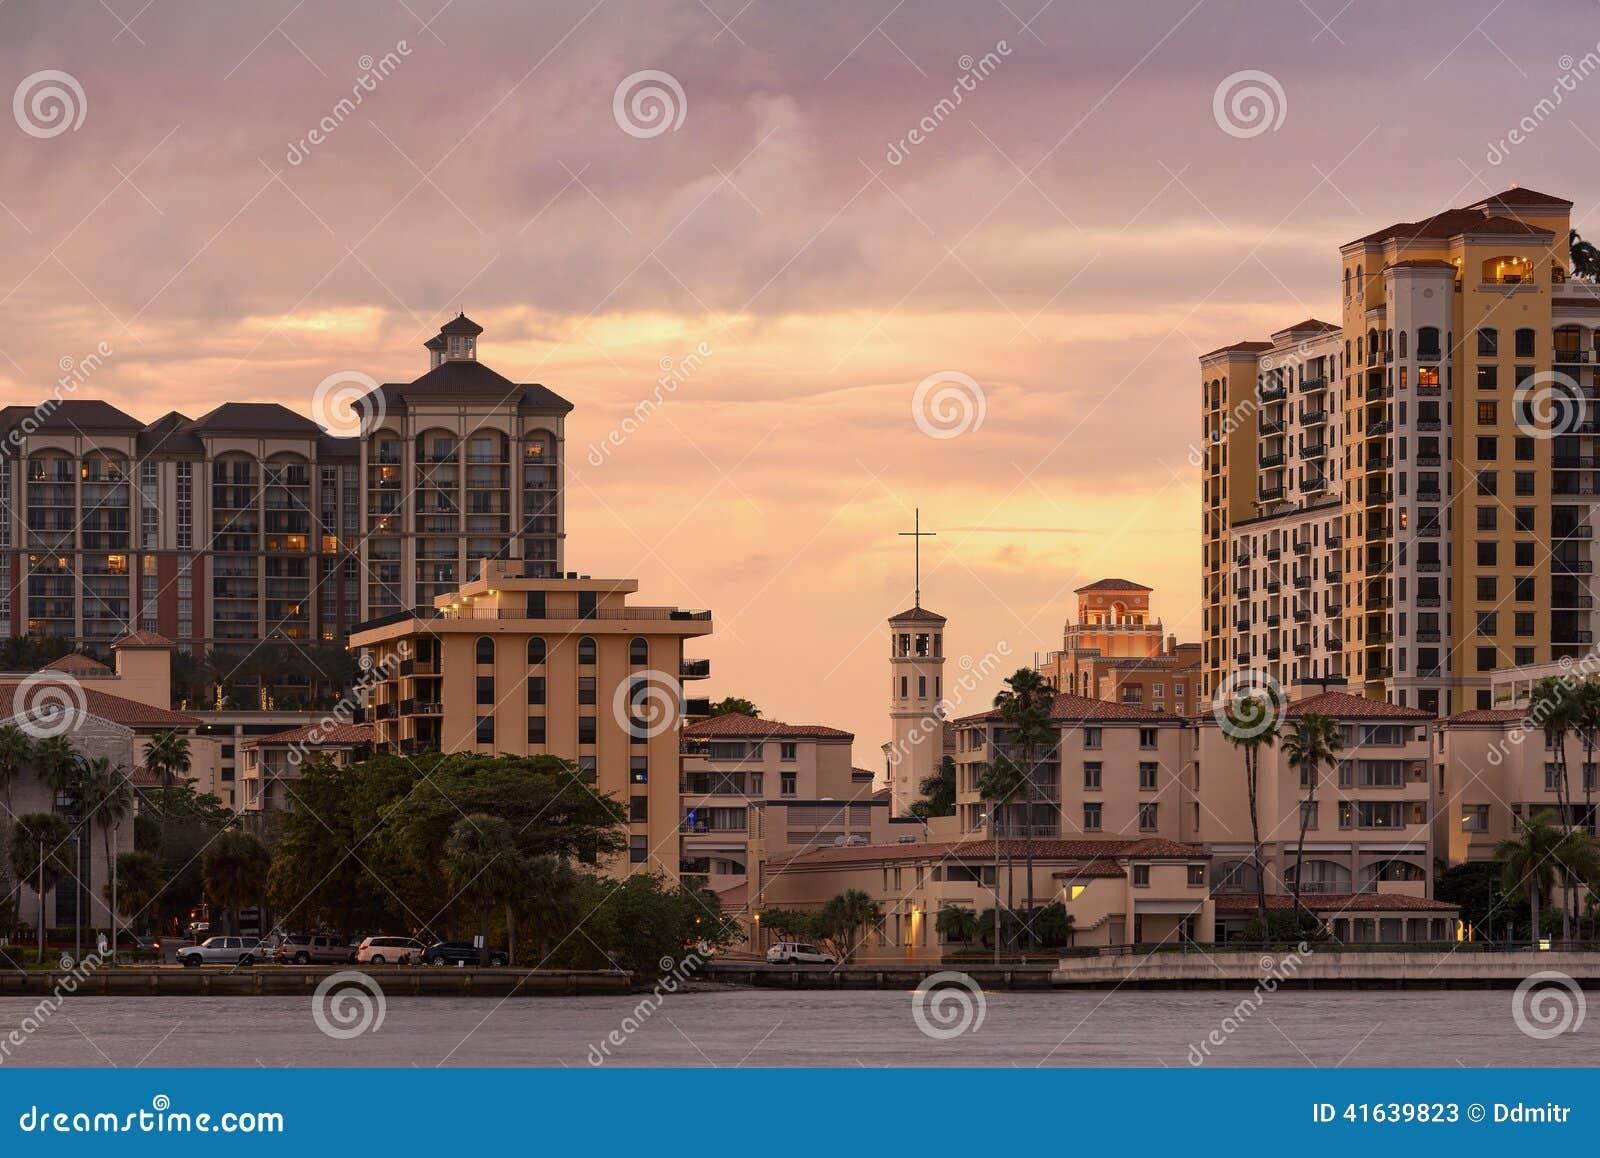 West Palm Beach (FL) United States  city photos : West Palm Beach, Florida, United States.